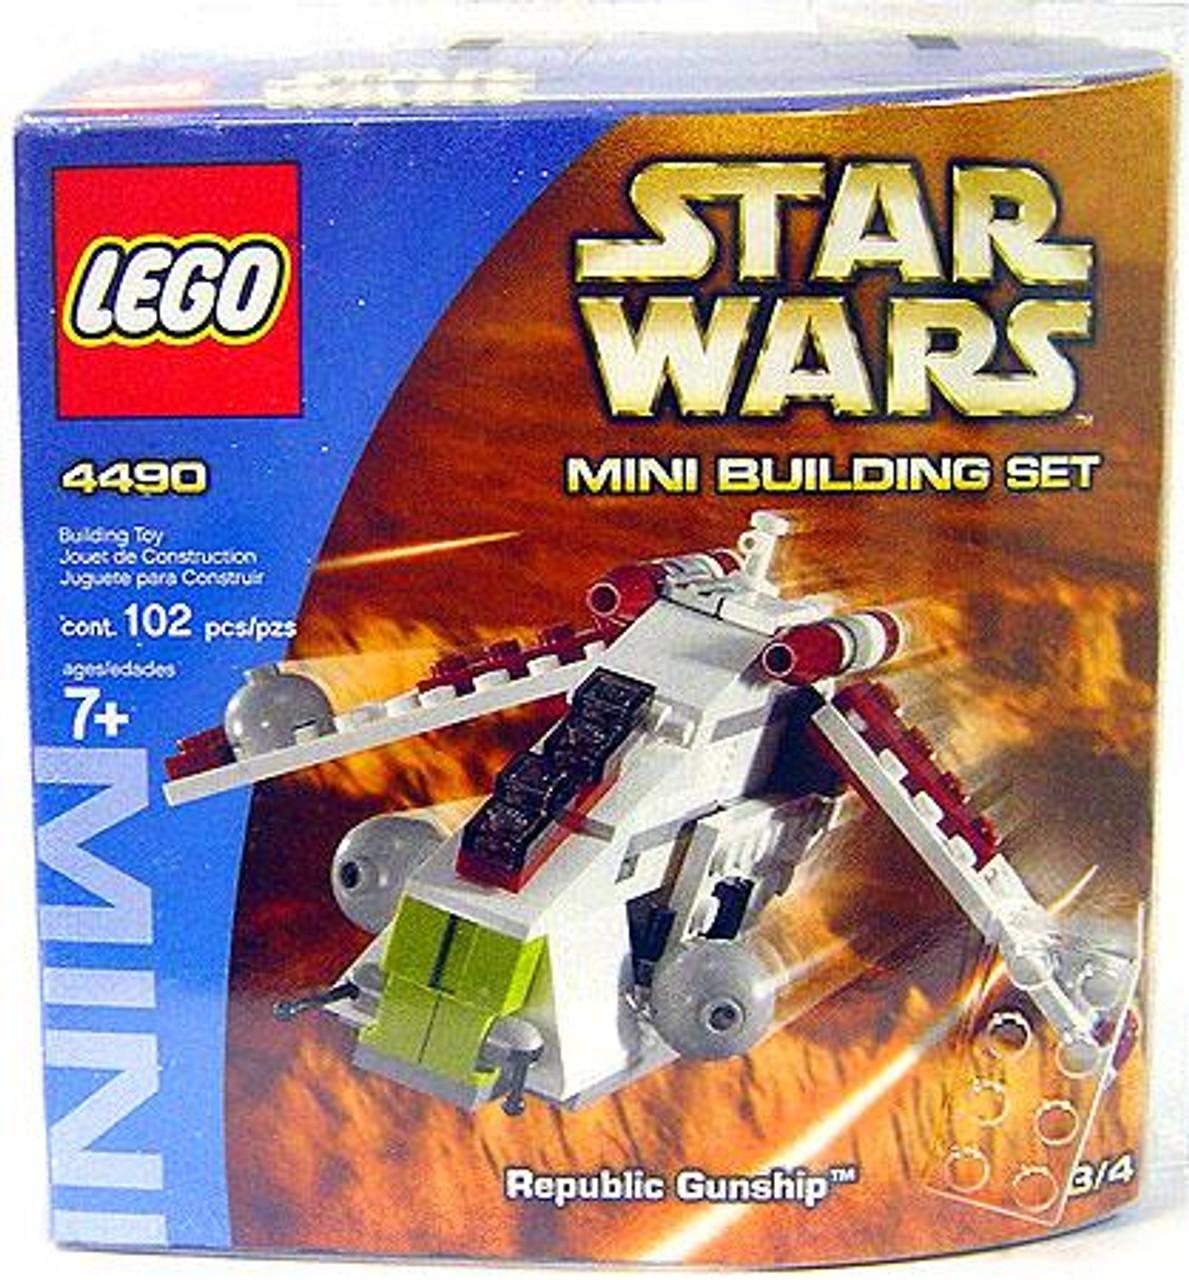 LEGO Star Wars The Clone Wars Mini Building Sets Republic Gunship Set #4490